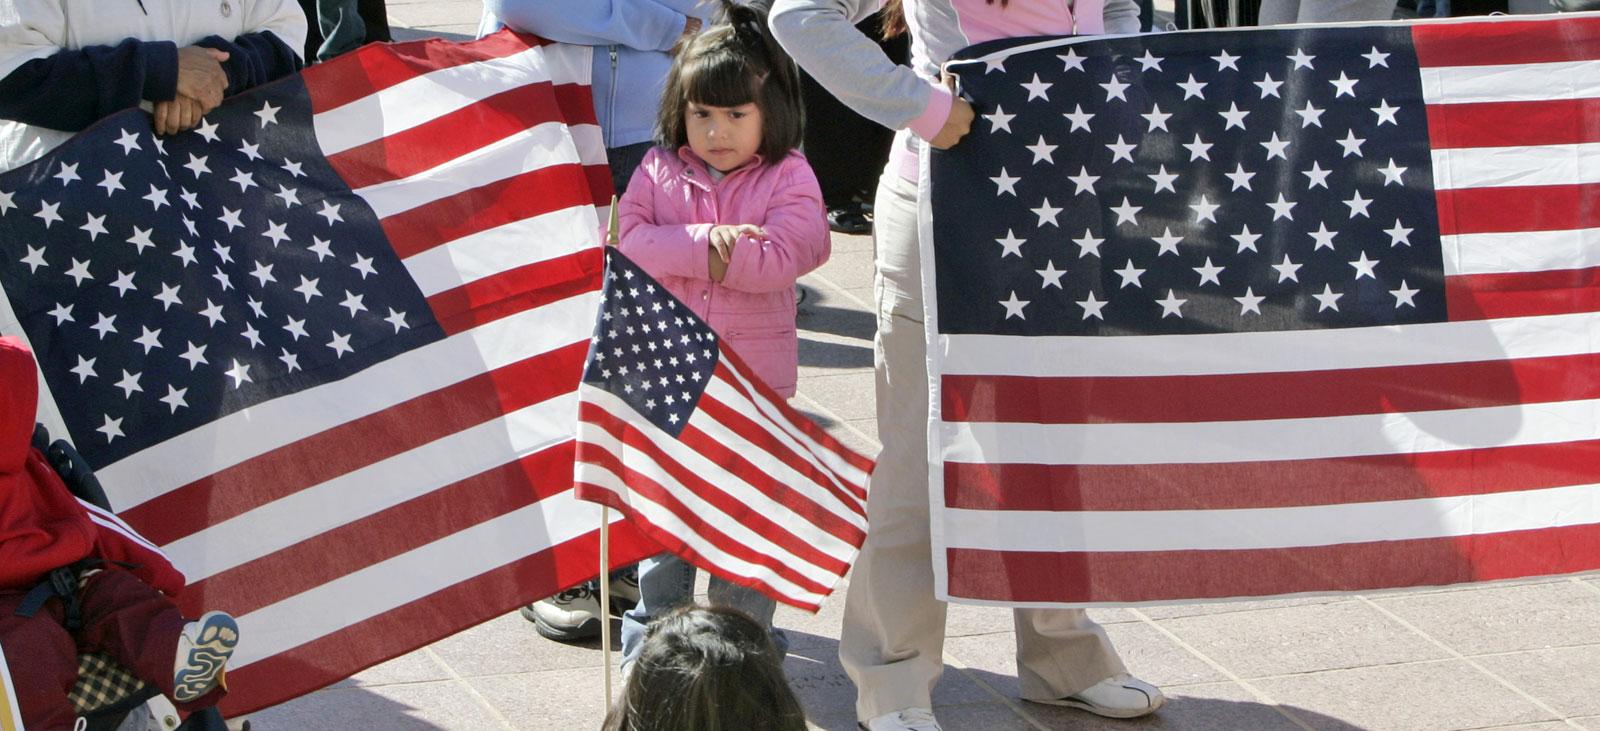 inmigration